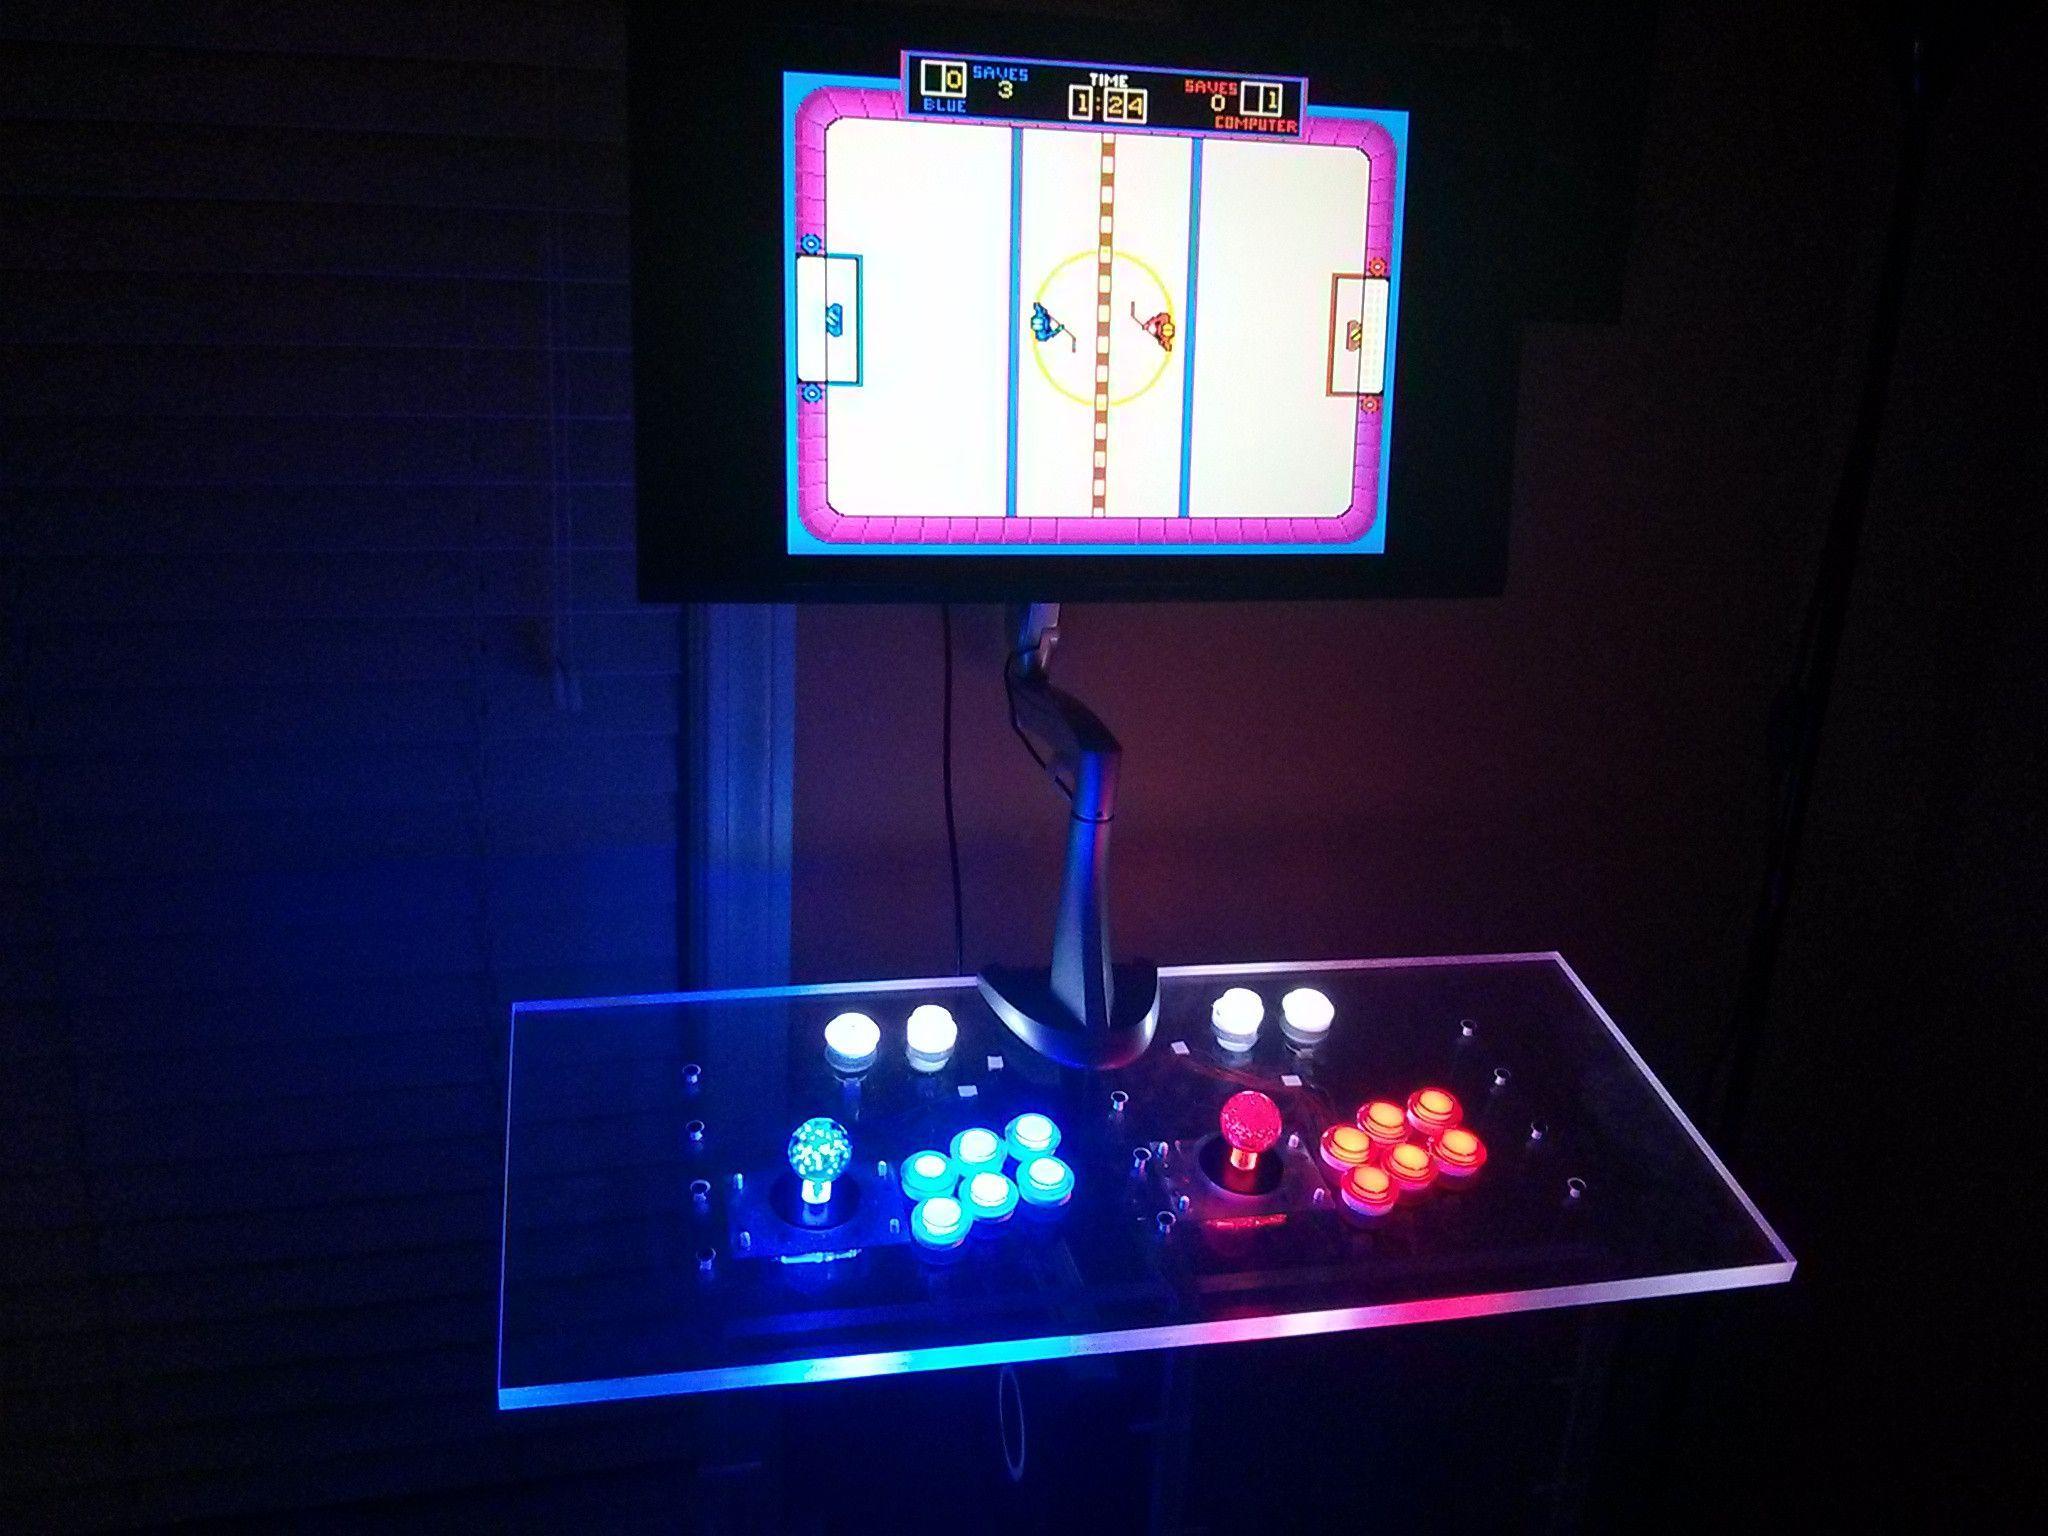 Clear Plexiglass Arcade Controls via Reddit user